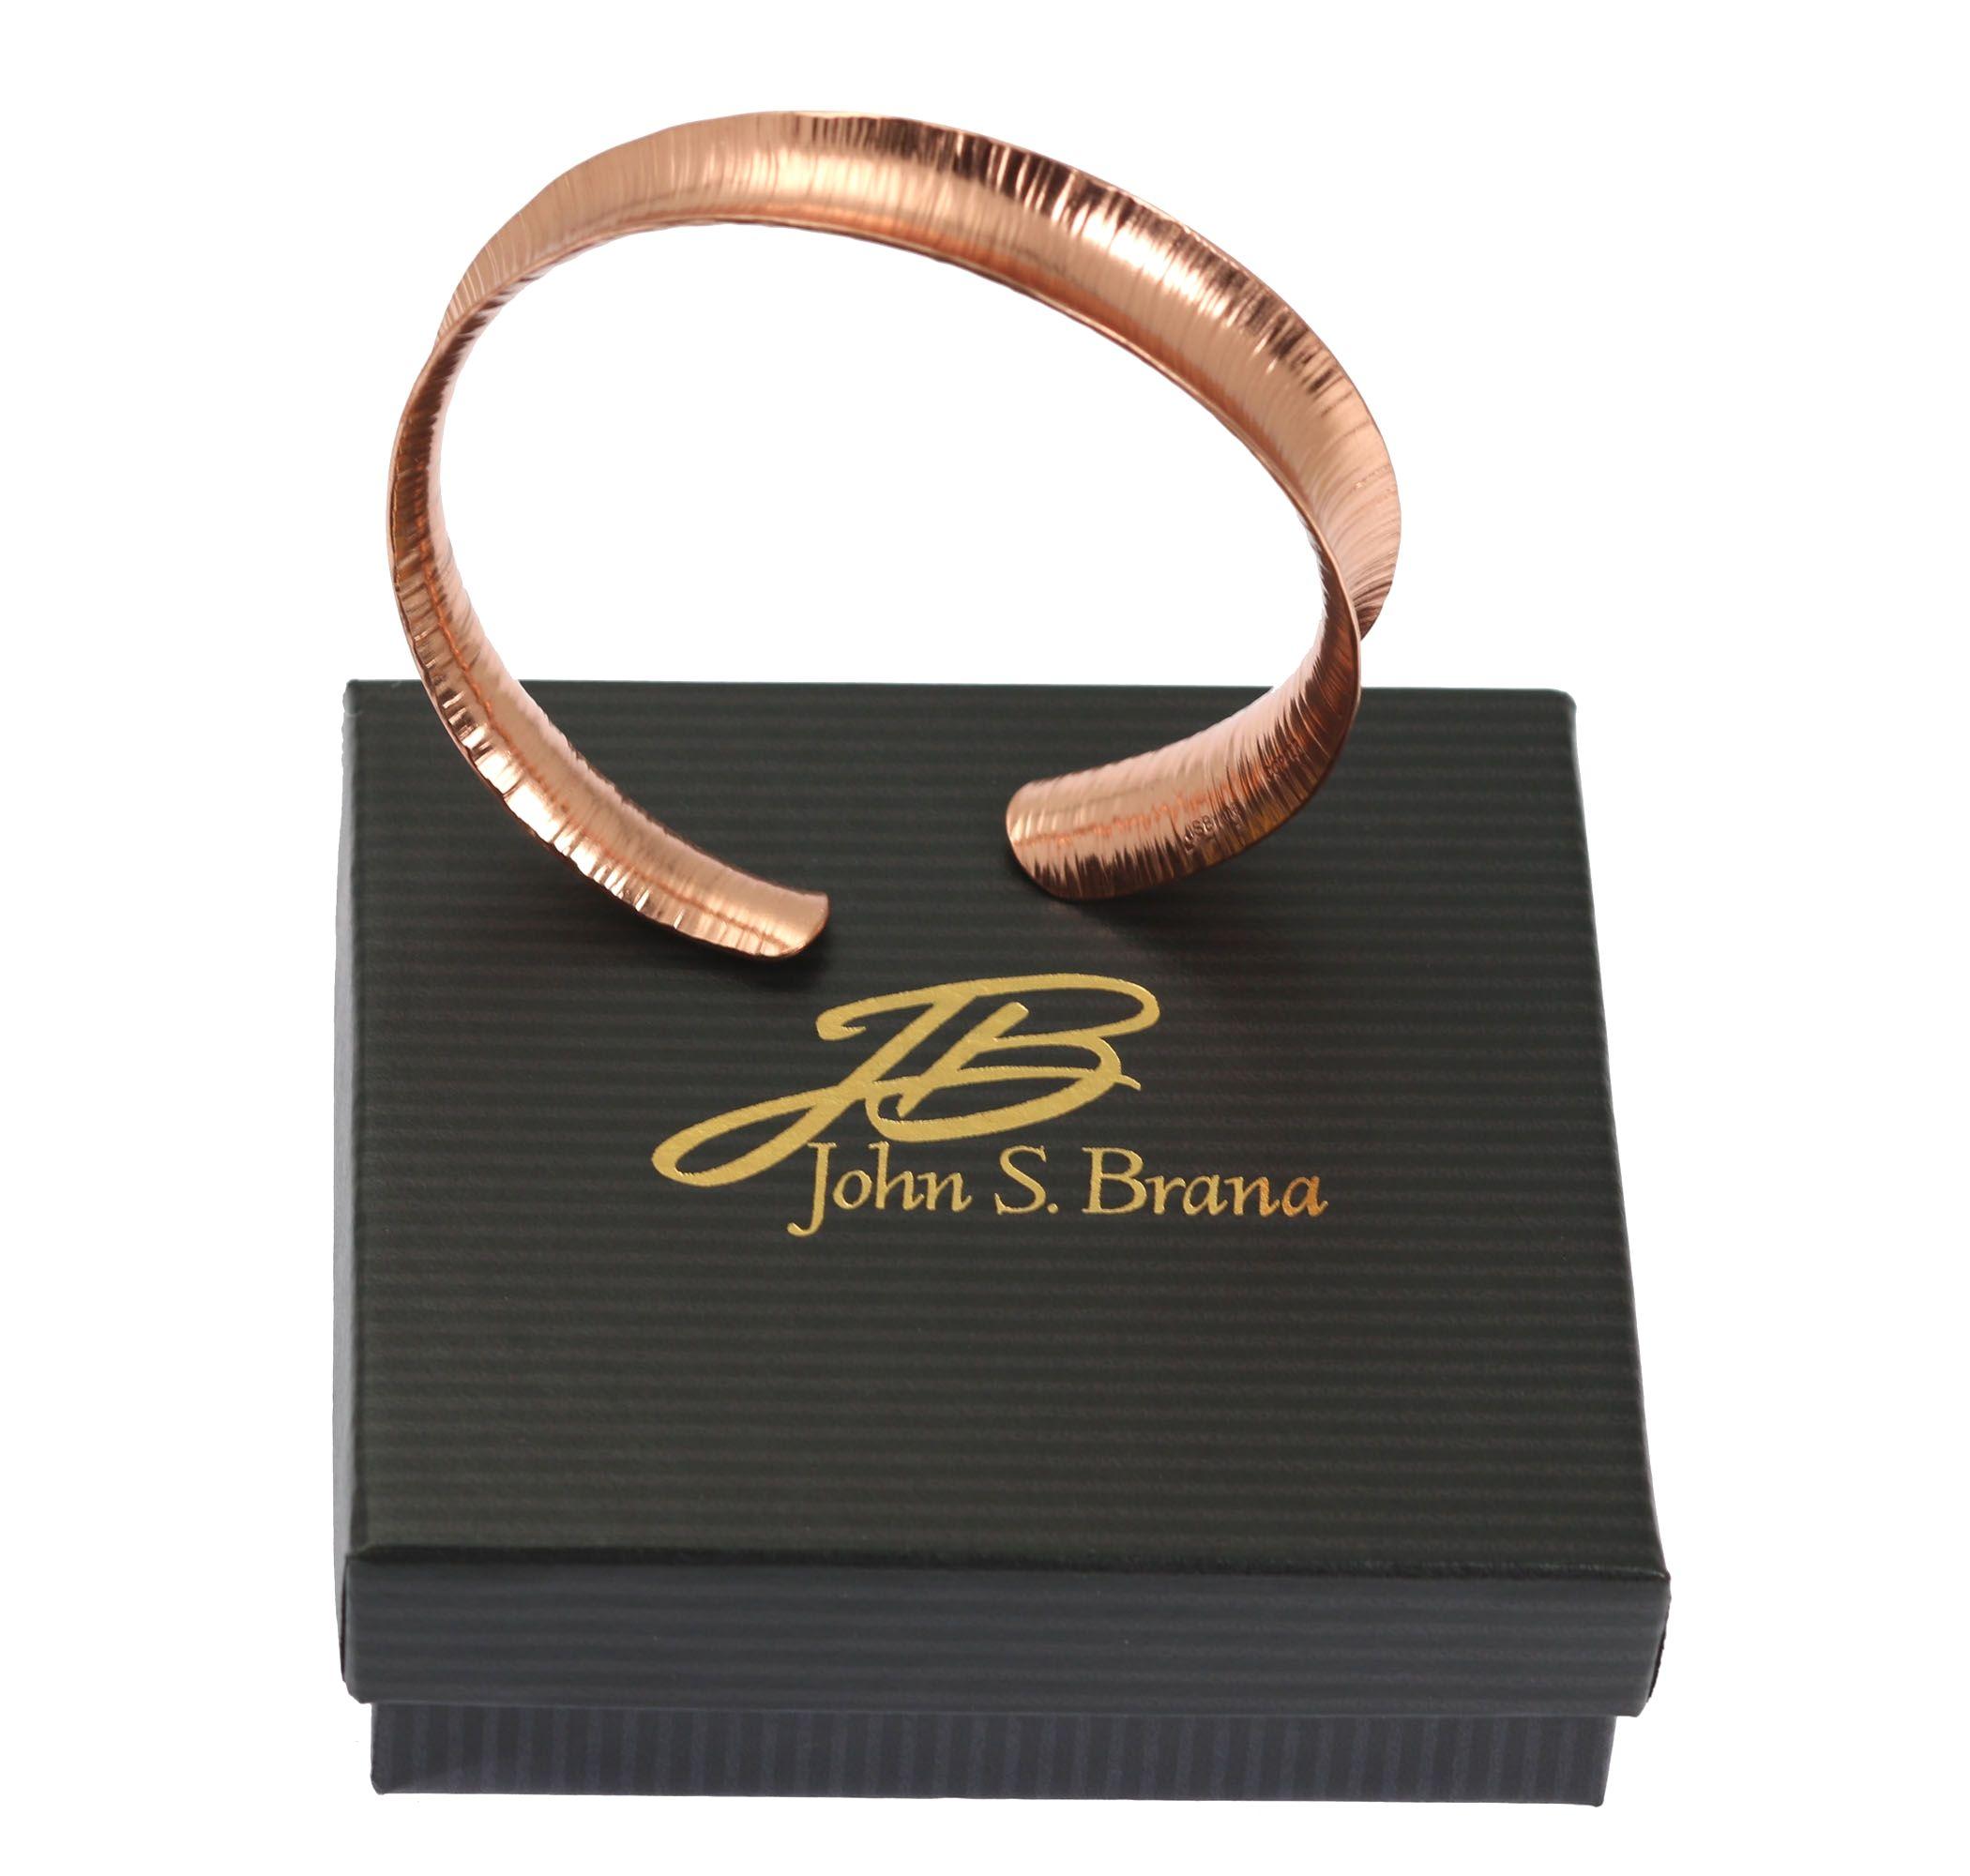 NEW! Unique Anticlastic Chased Copper Bracelet Showcased on #AmazonHandmade #7thAnniversary http://amzn.to/2kM1dua